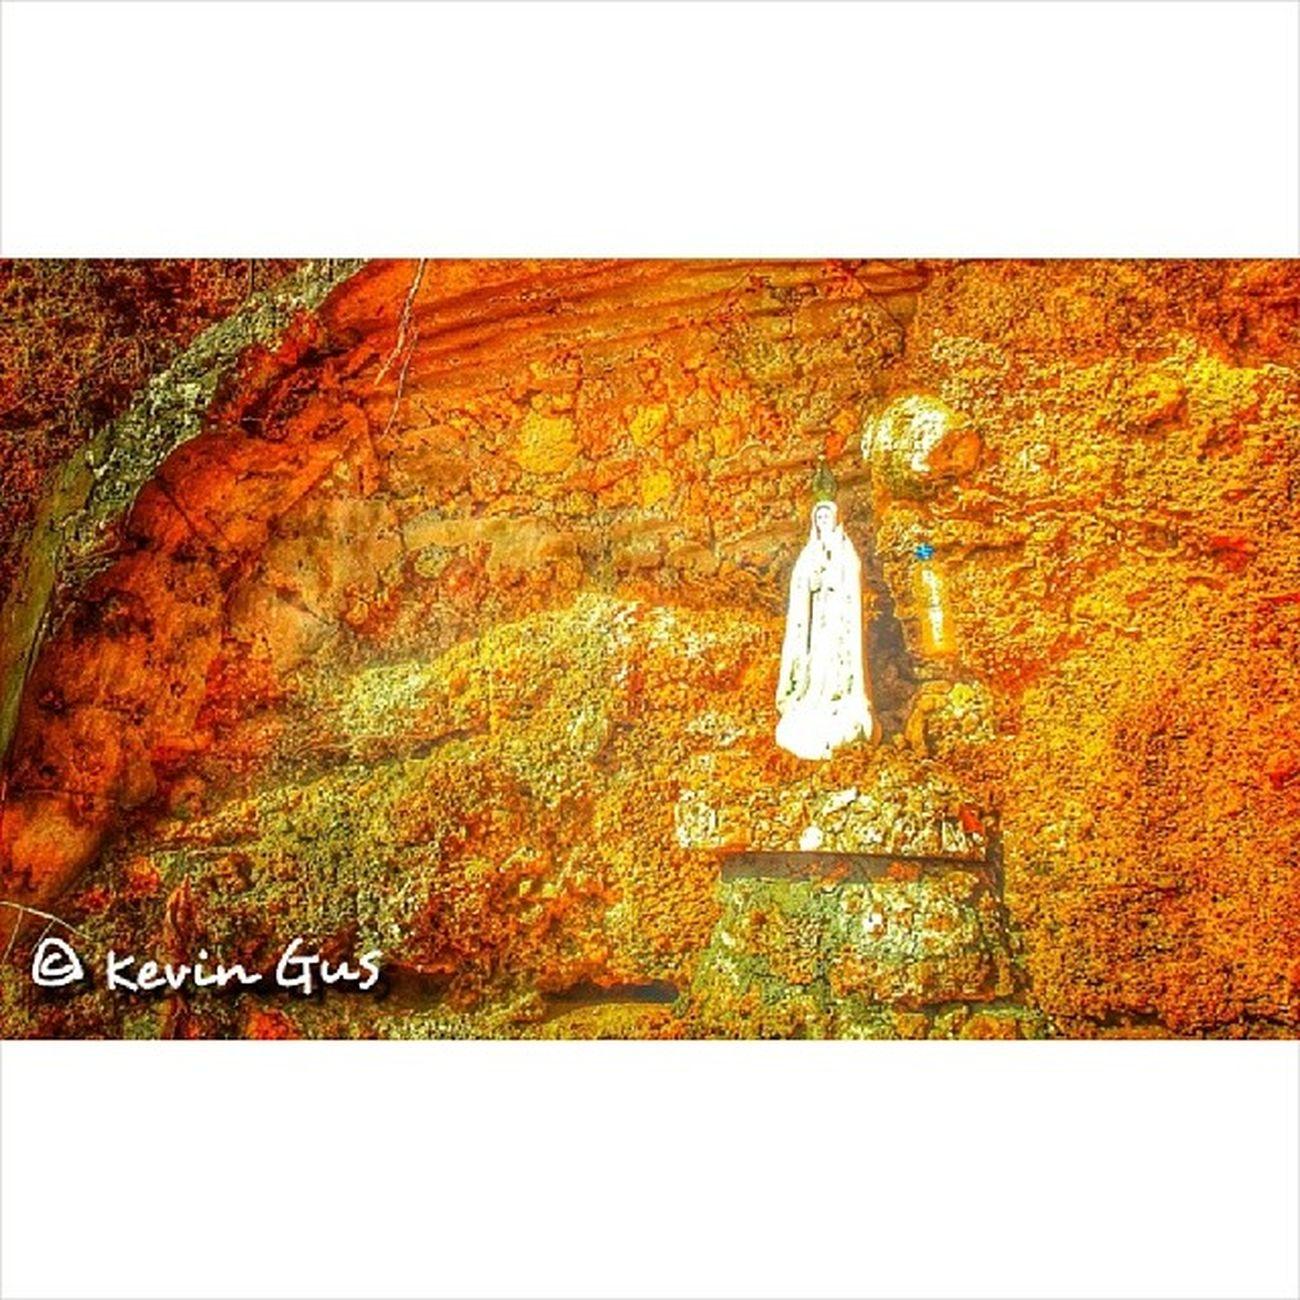 Our Lady of Fatima Fátima Ourladyoffatima Mamamary Holymother grotto pinoy filipino filipinas philippines